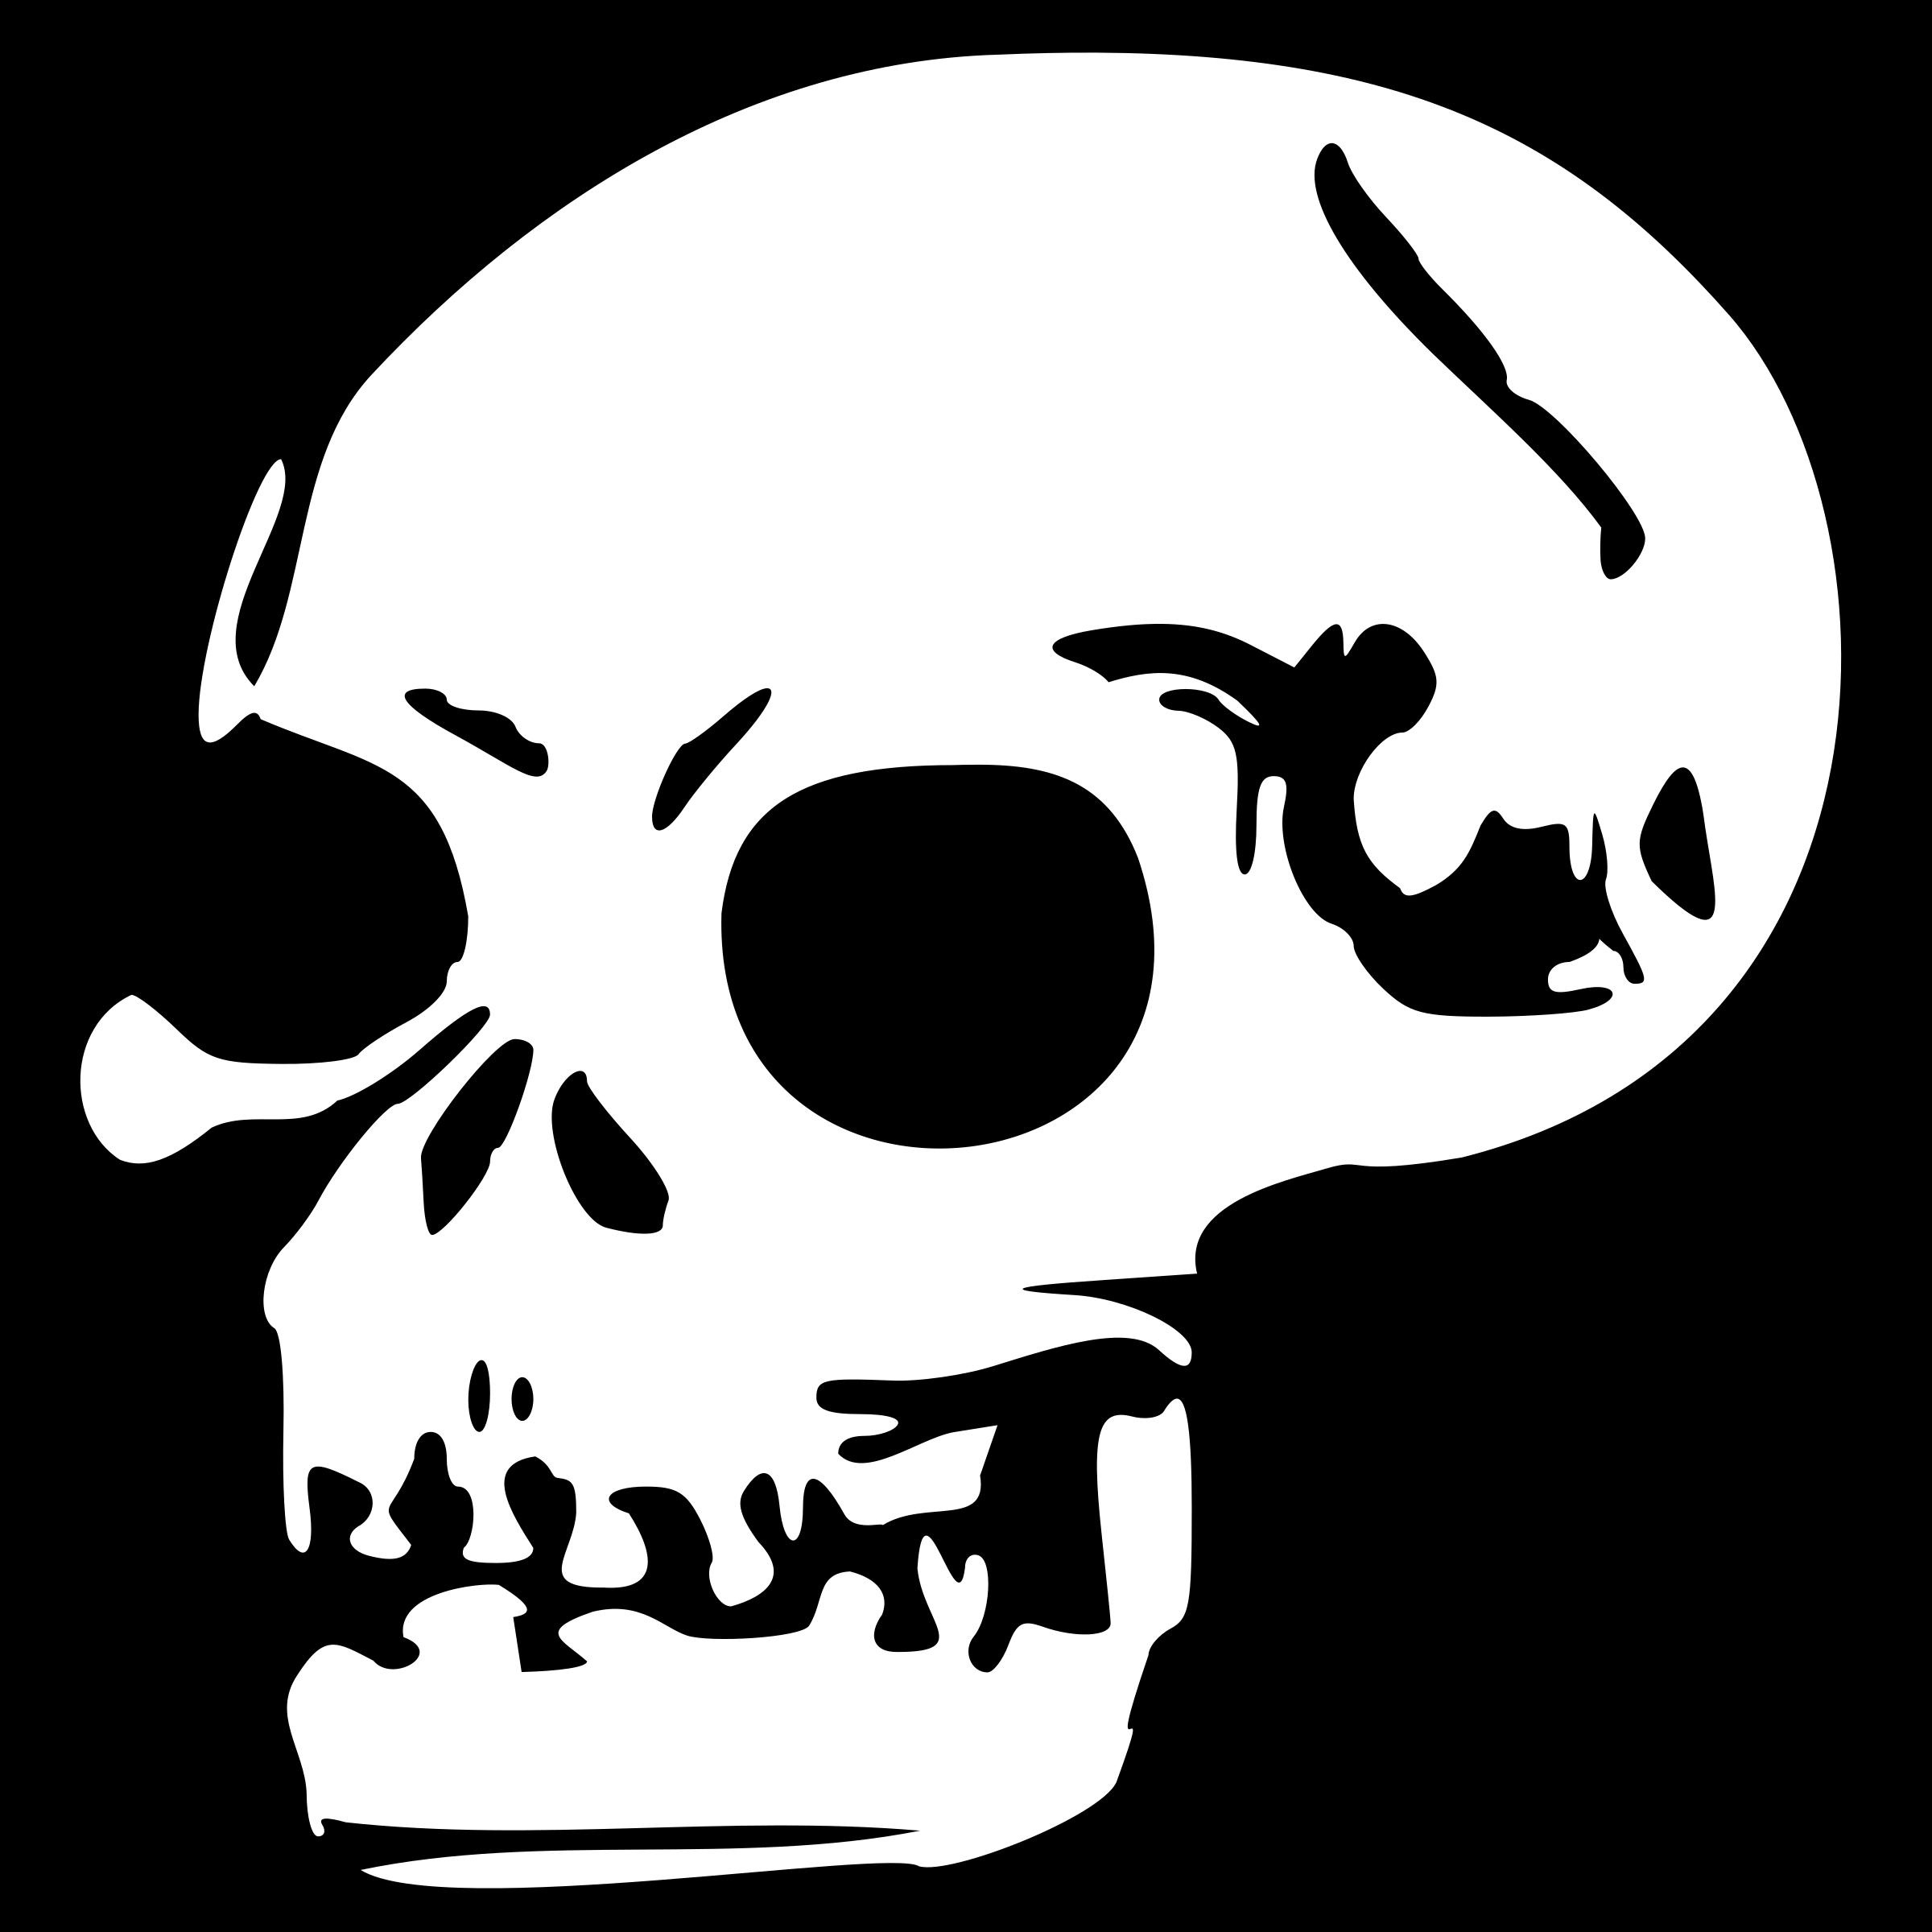 Dead clipart skull drawing. Big image png